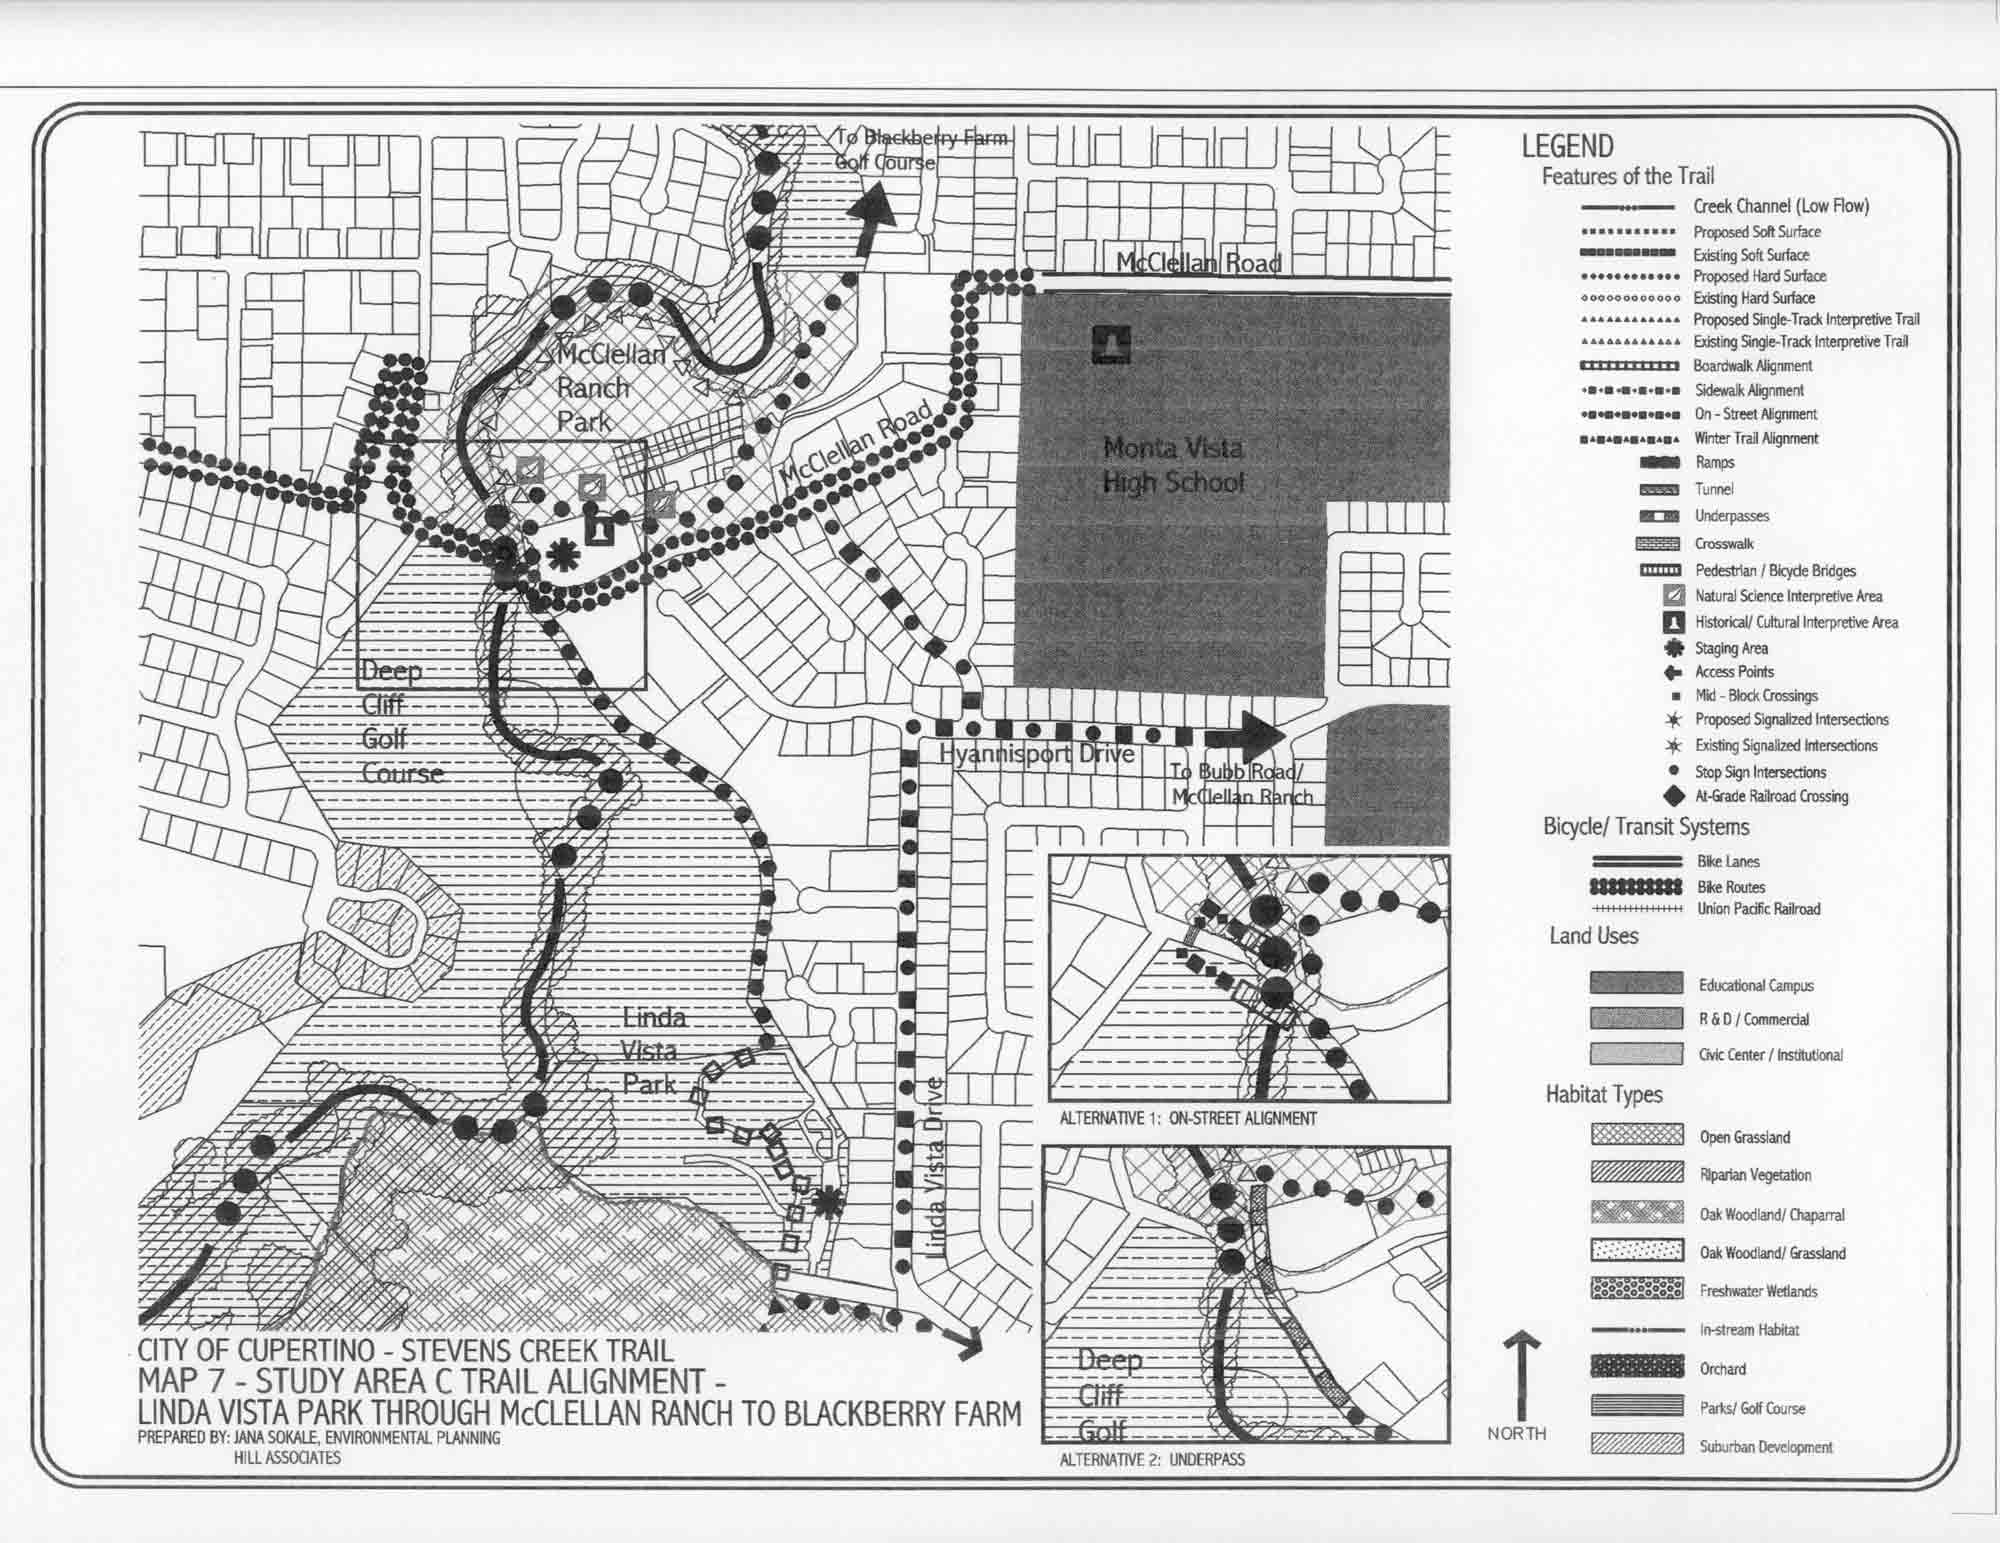 cupertino 2002 stevens creek trail feasibility study documents